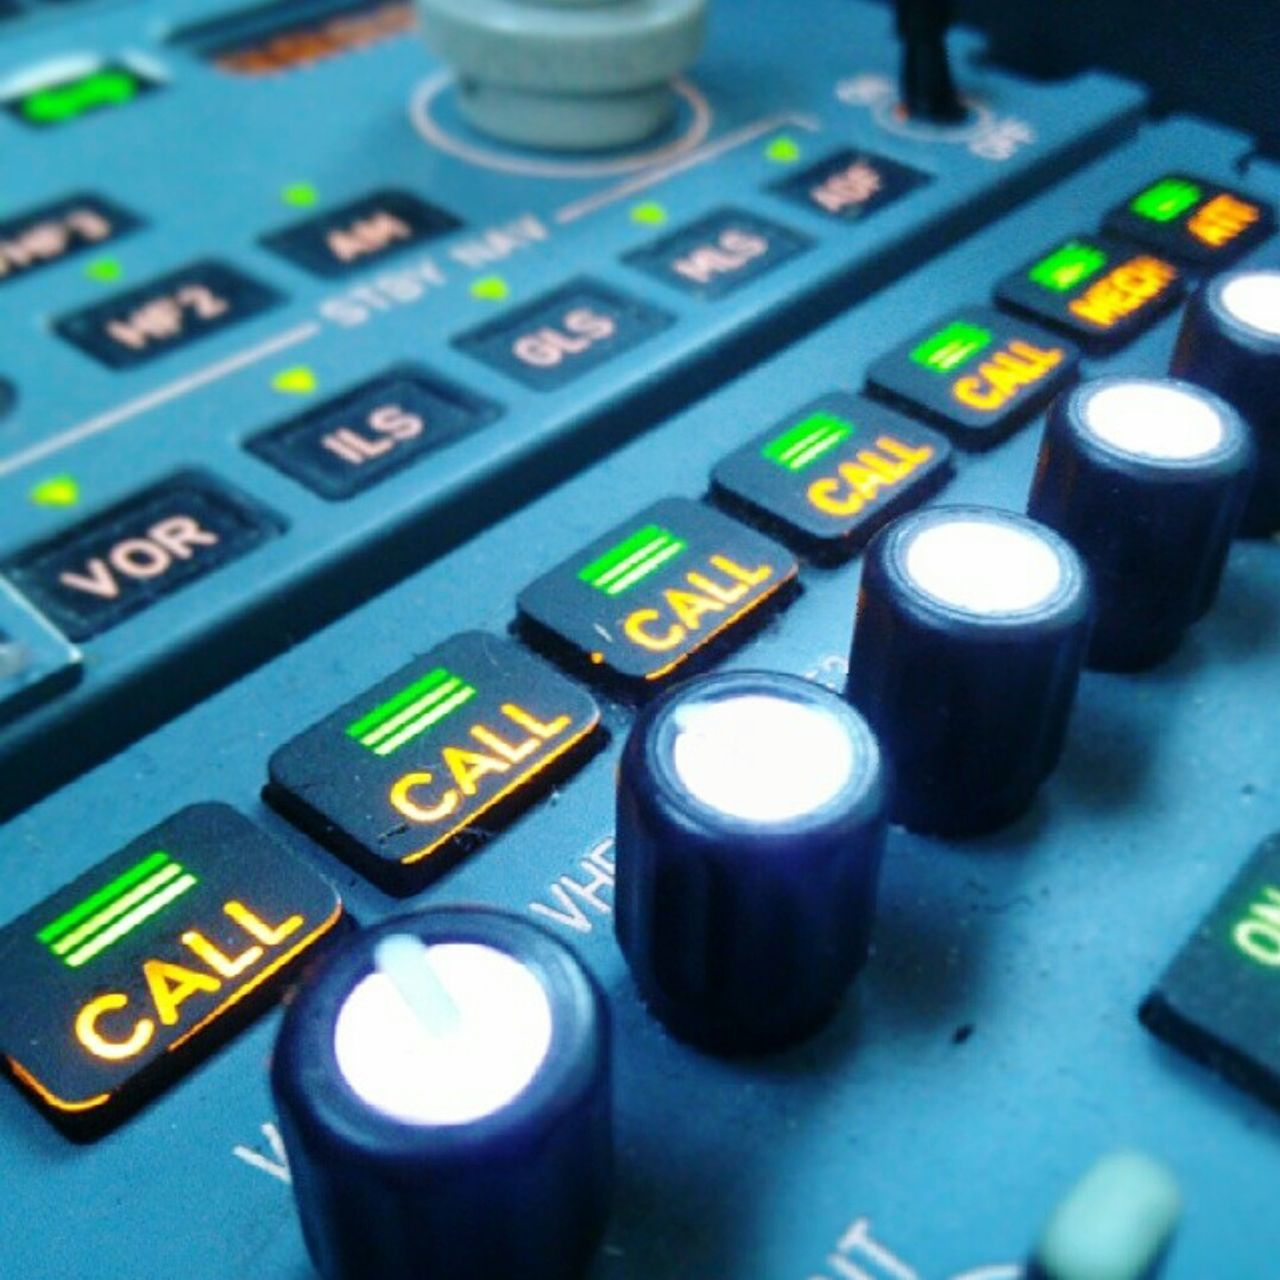 Aircraft panel close-up Control Close-up Keypad No People Communication Indoors  Aircraft Aircraft Photography